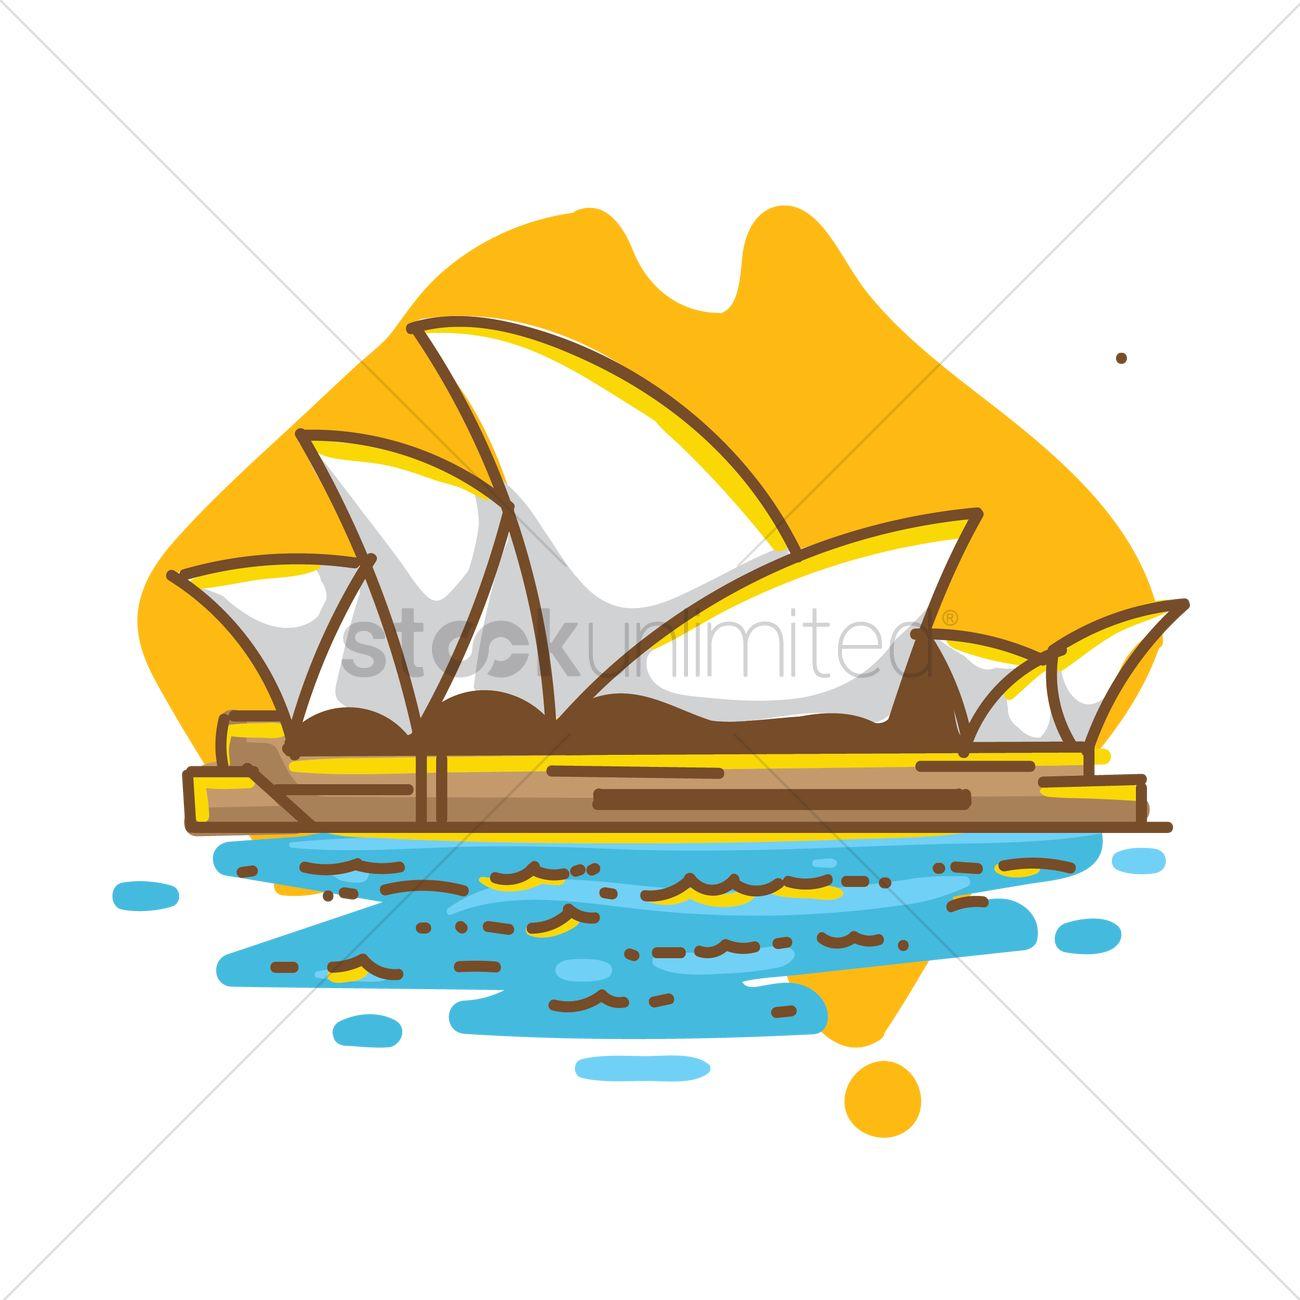 sydney opera house on australia map 1961804 - Get Sydney Opera House Cartoon Image  Pictures